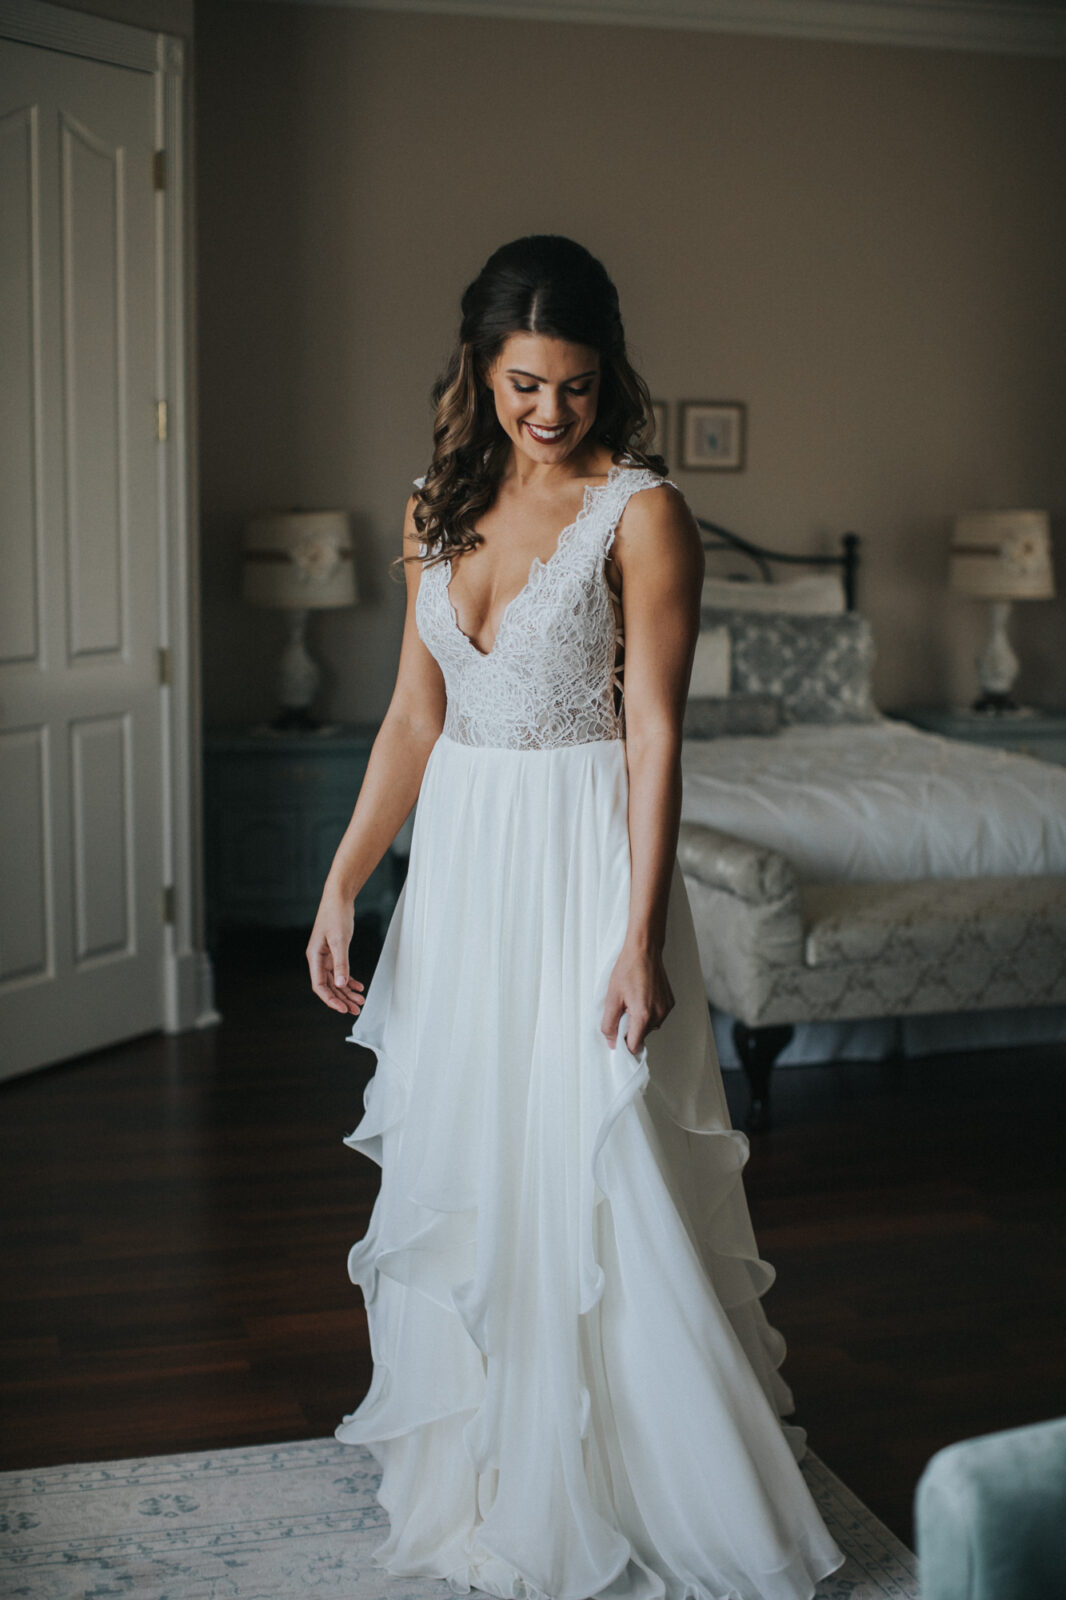 Colorful Wedding Dresses Rental Los Angeles Ornament - All Wedding ...